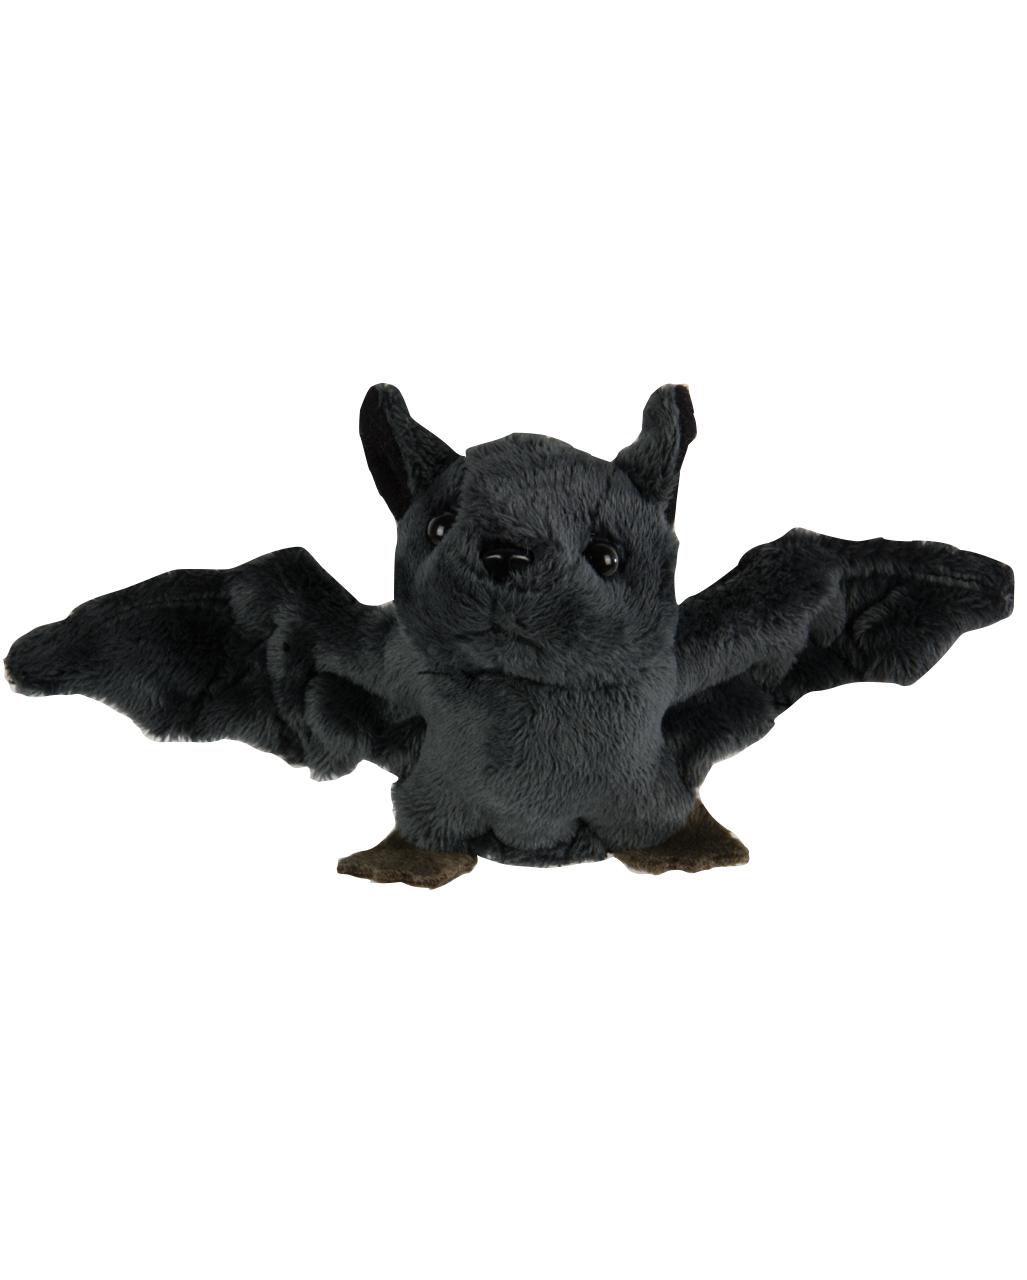 Plush Bat With Magnet